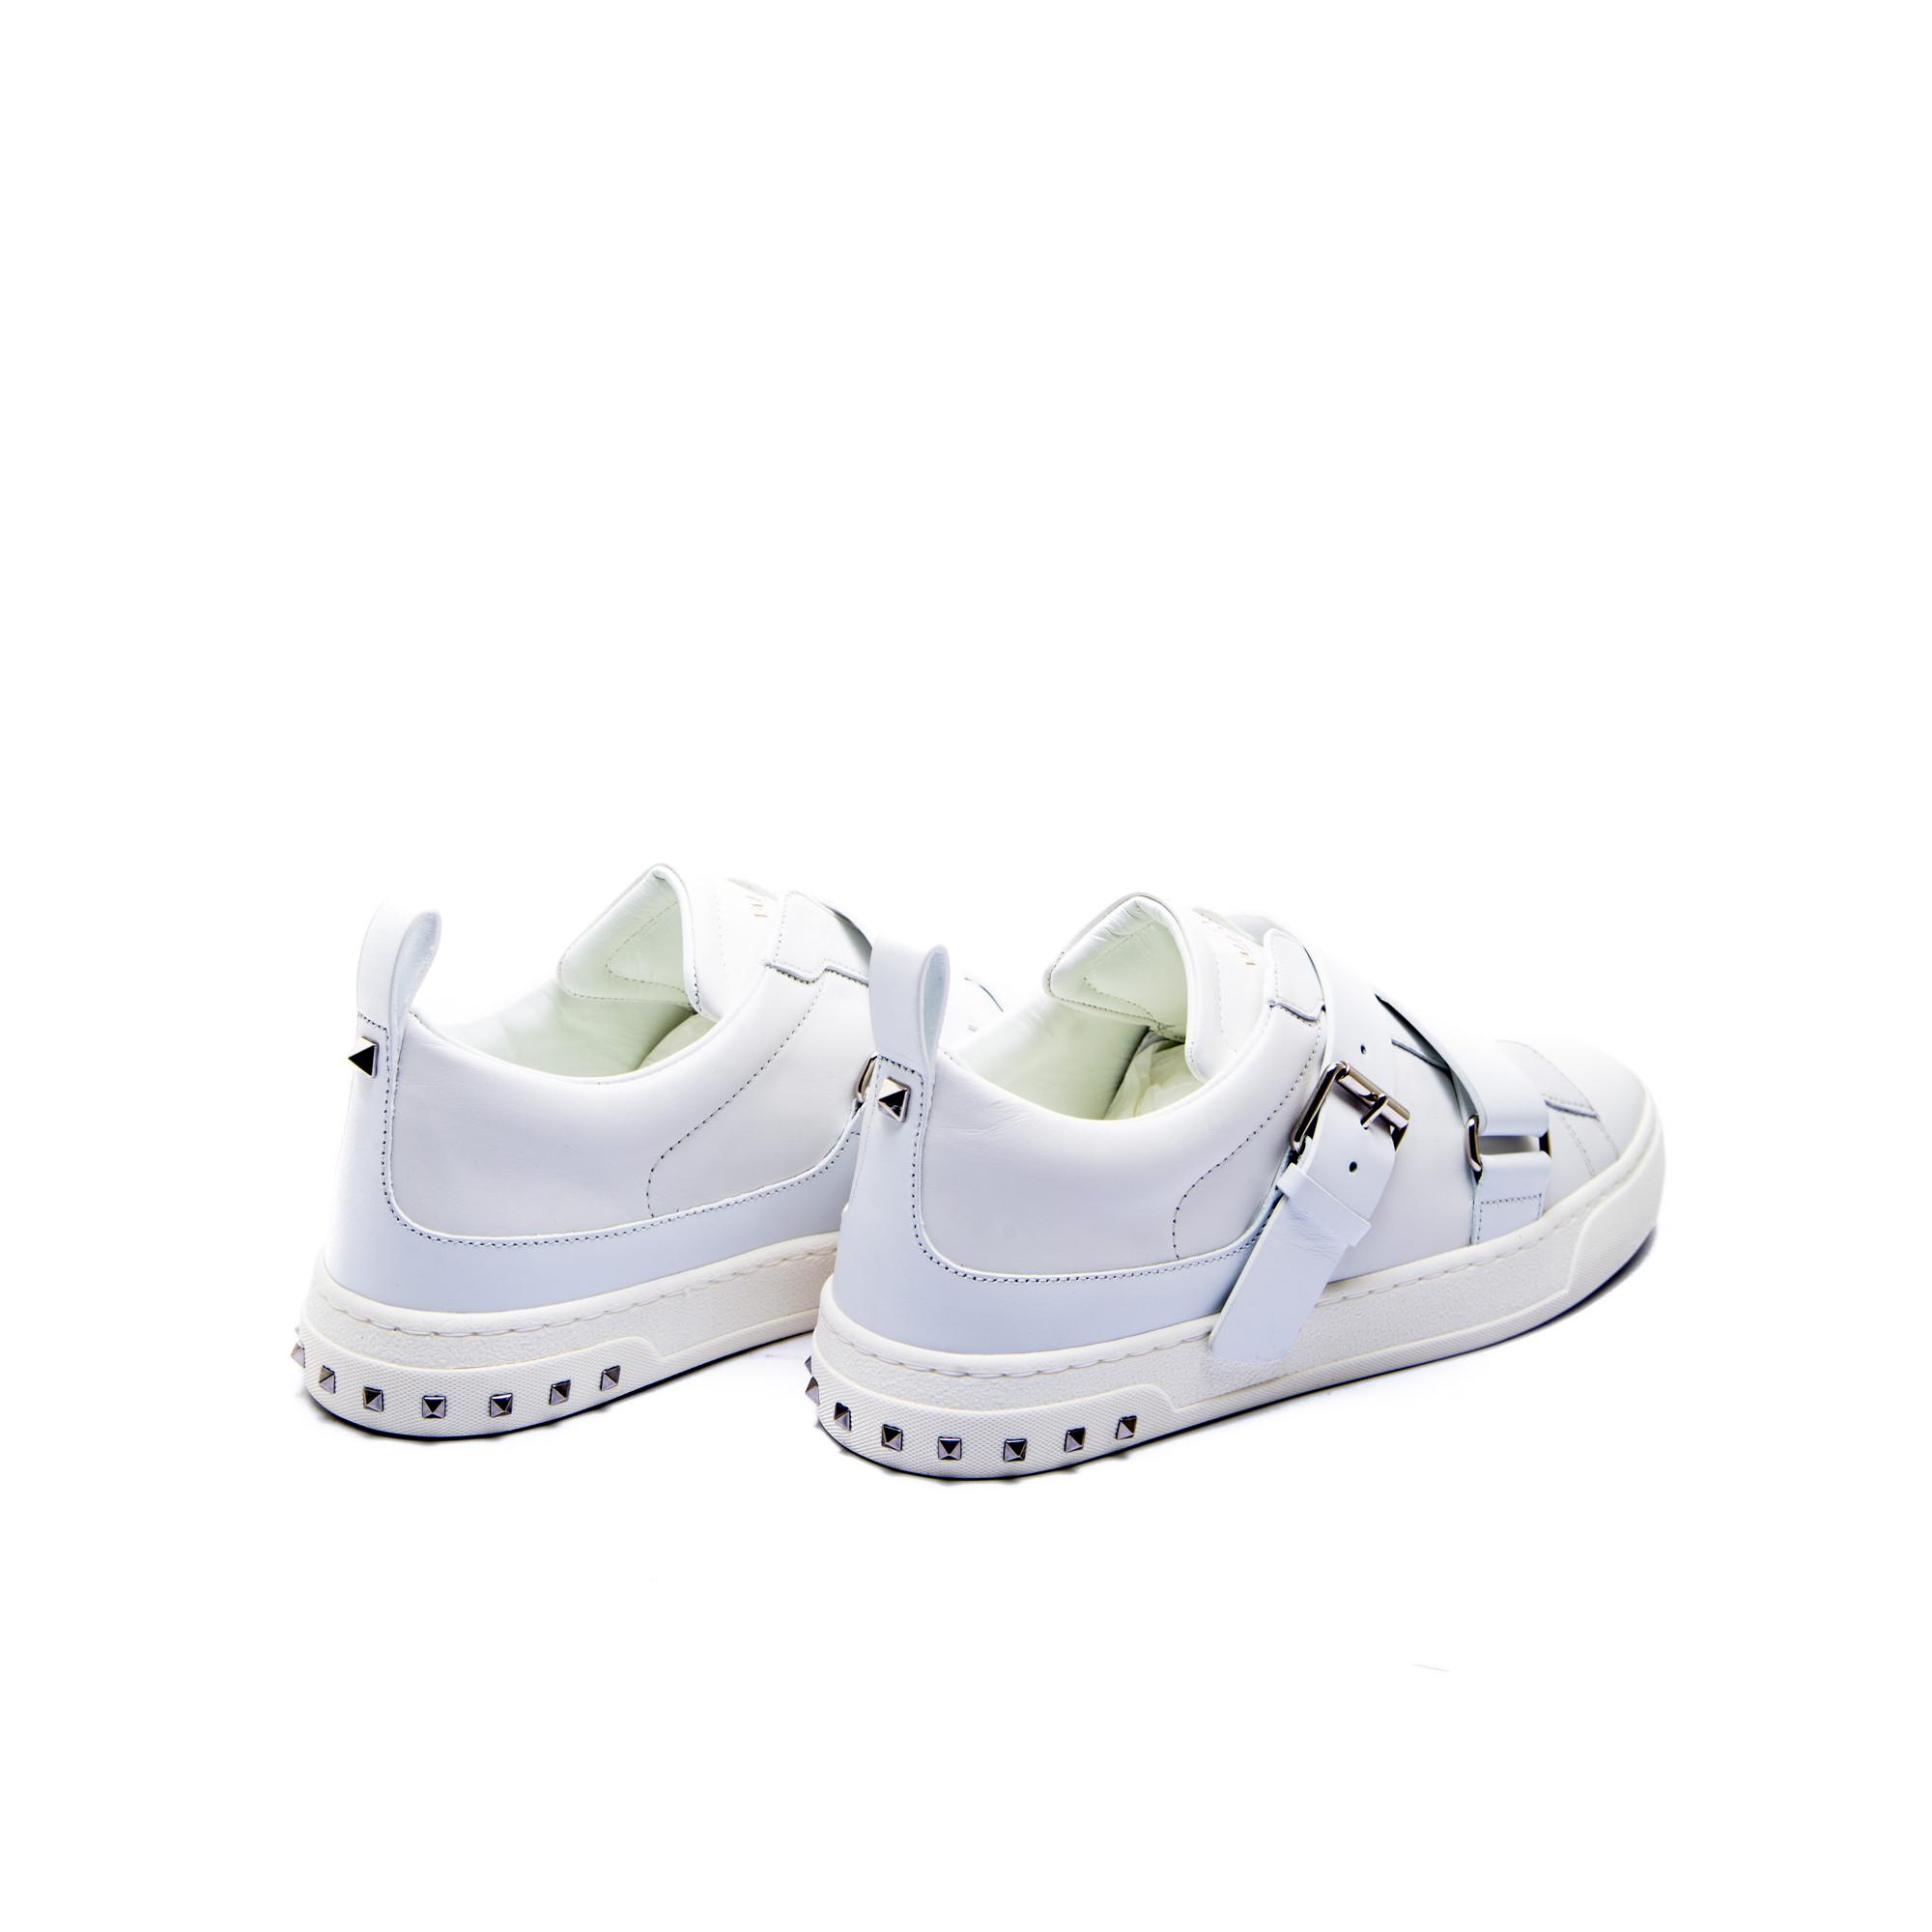 Blanc Giuseppe Zanotti Chaussures Avec Boucle Pour Femmes o7HrHUk